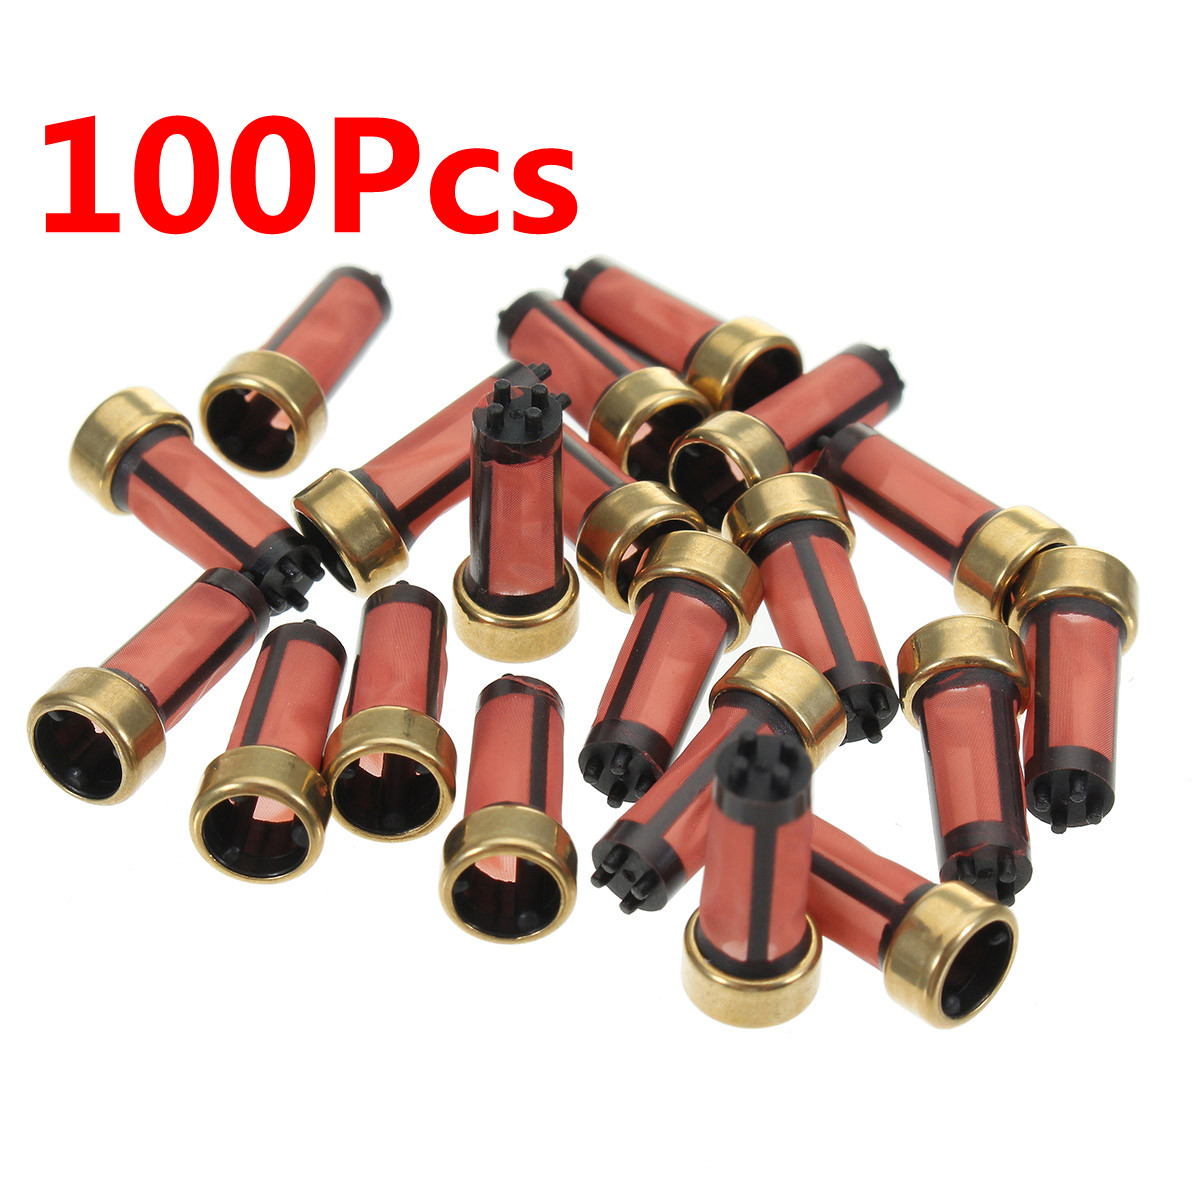 100pcs Fuel Injector Micro Basket Filter Fit for Honda Injector repair kits